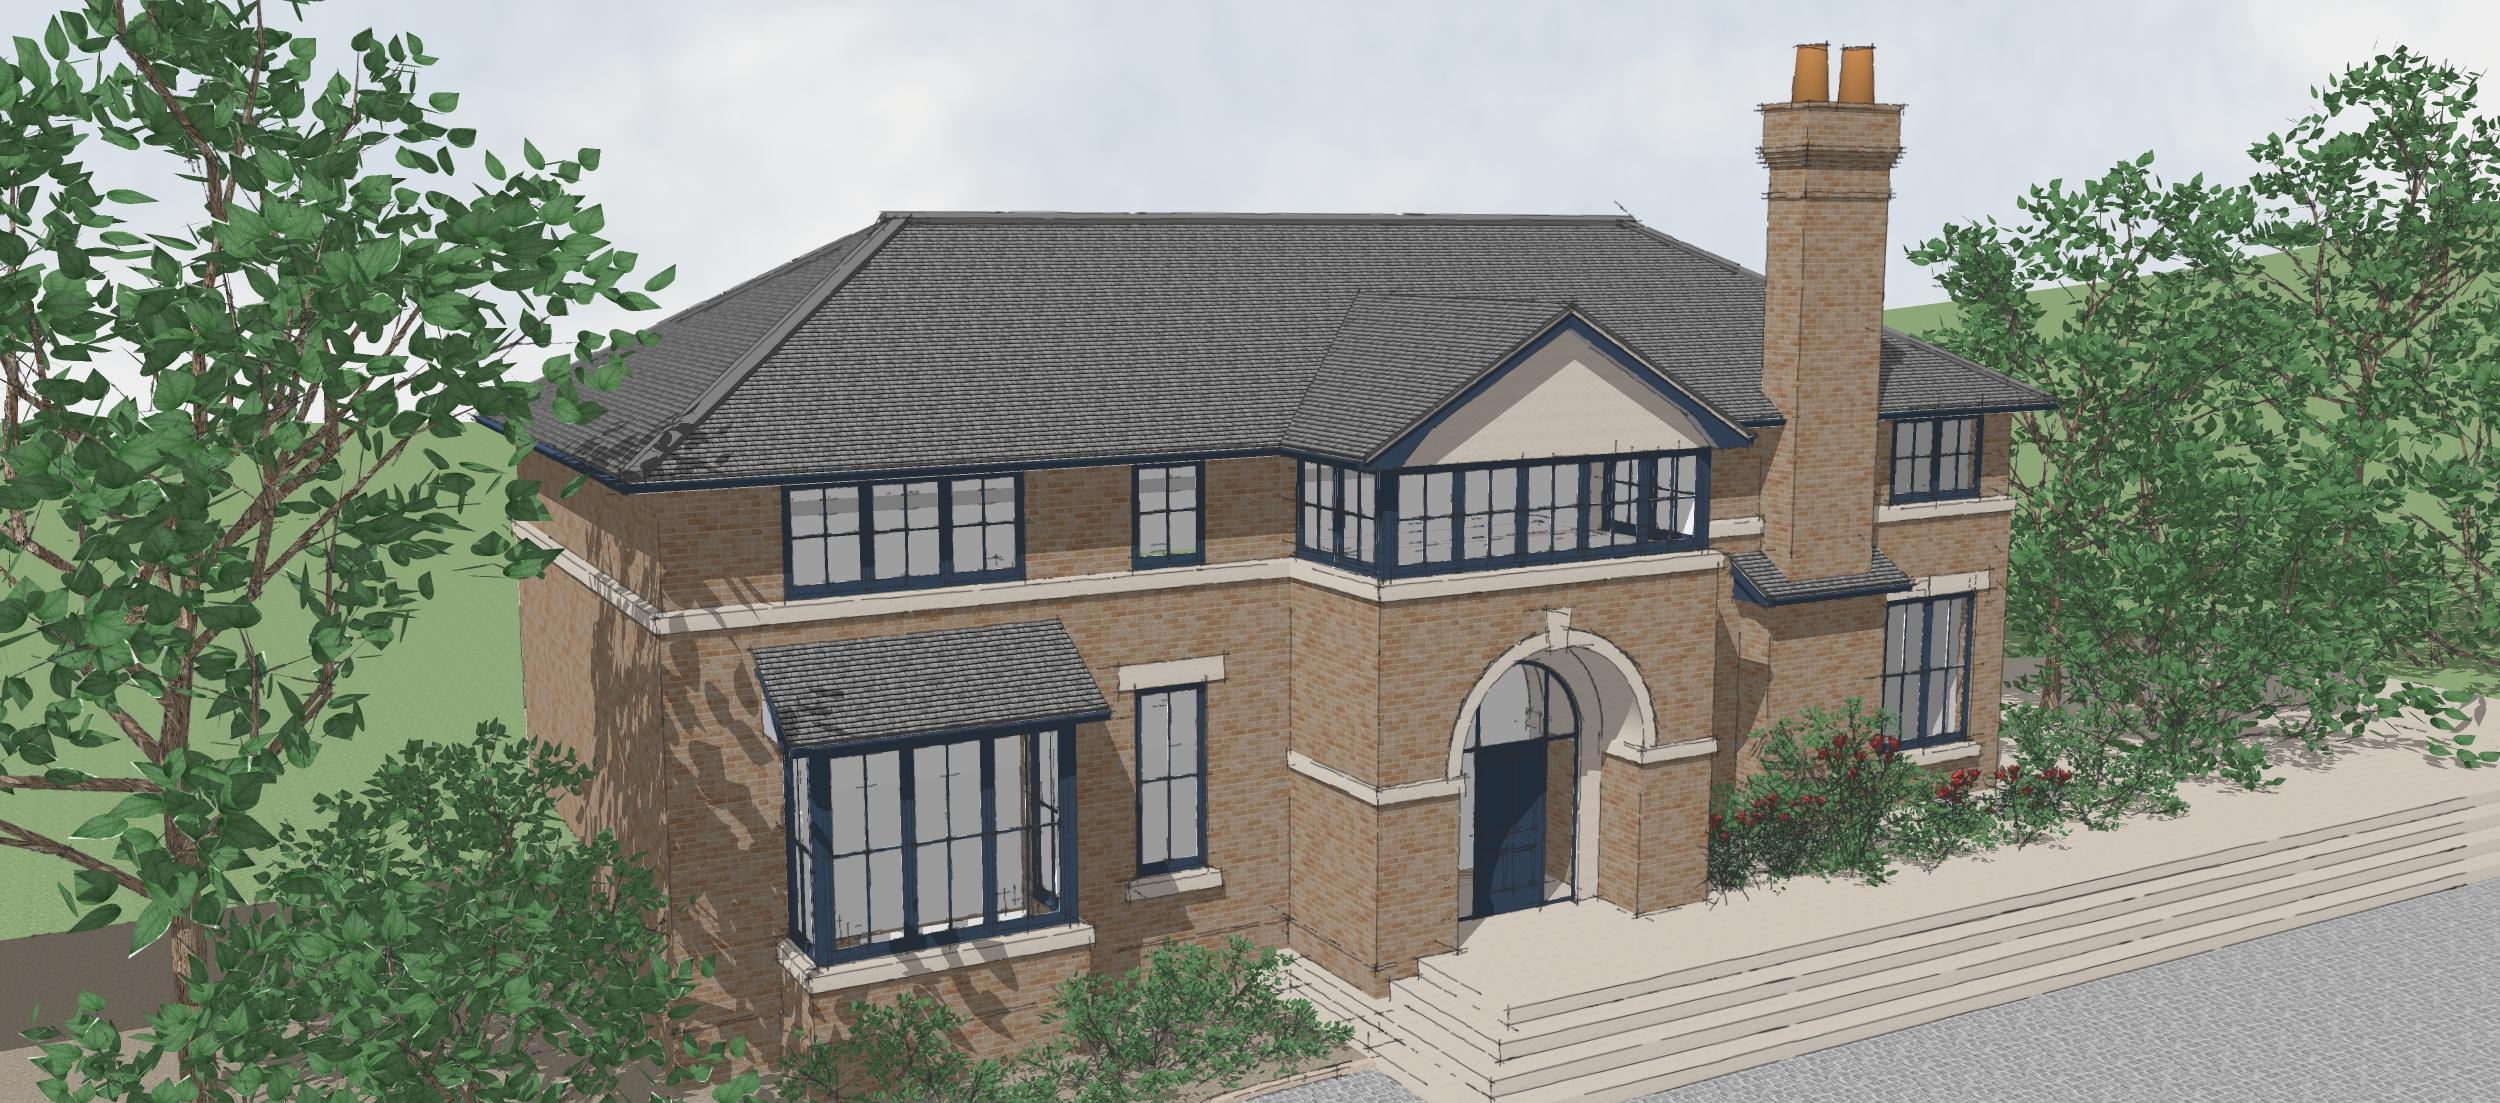 New house, Sevenoaks, Kent